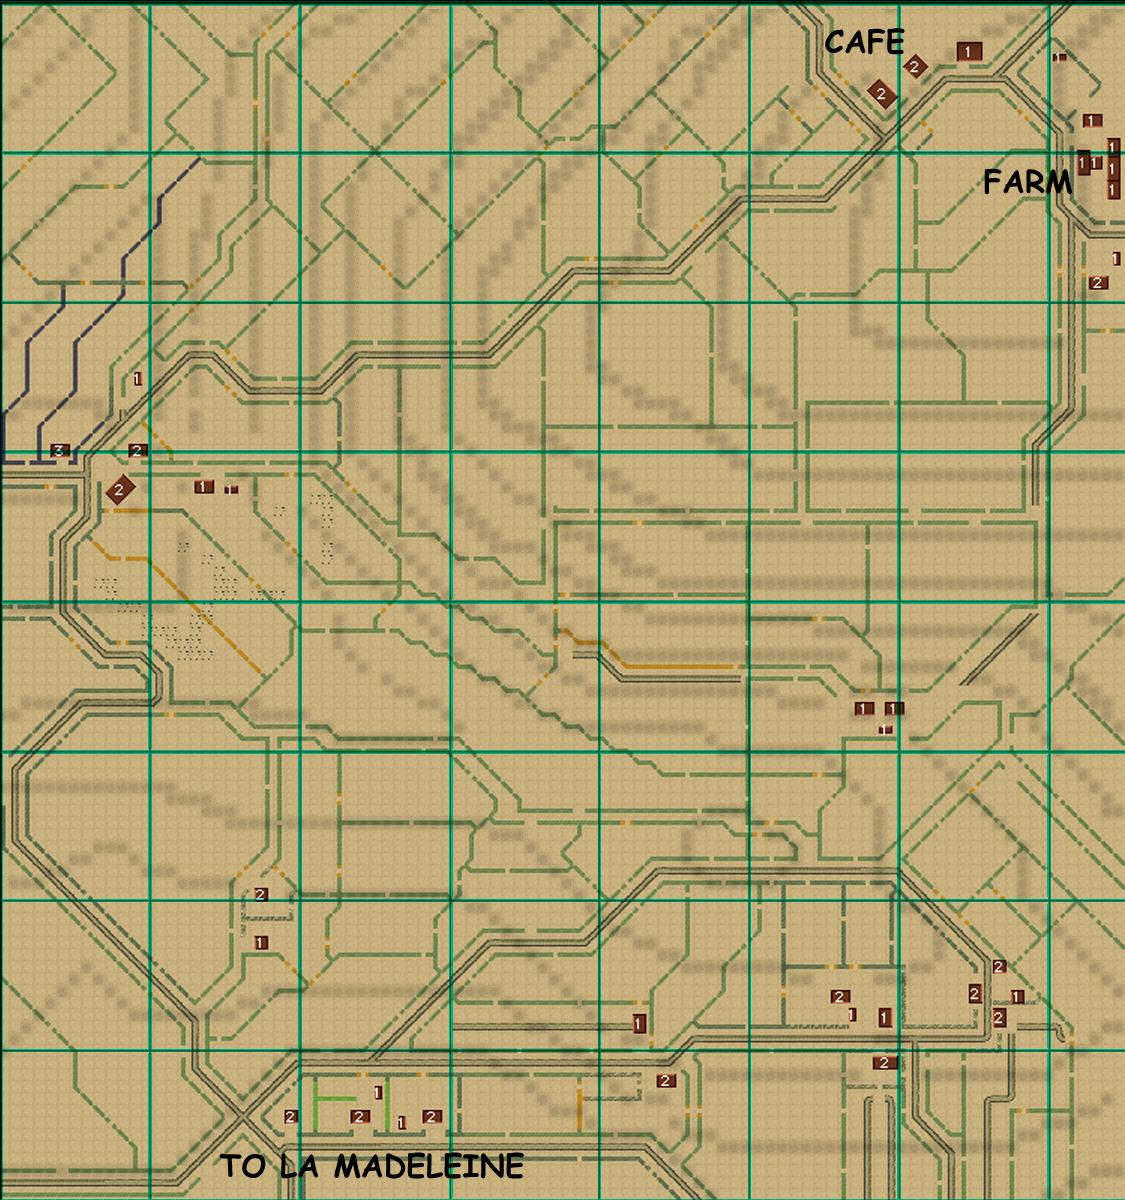 TERRAIN-+BOCAGE+MAP.PNG